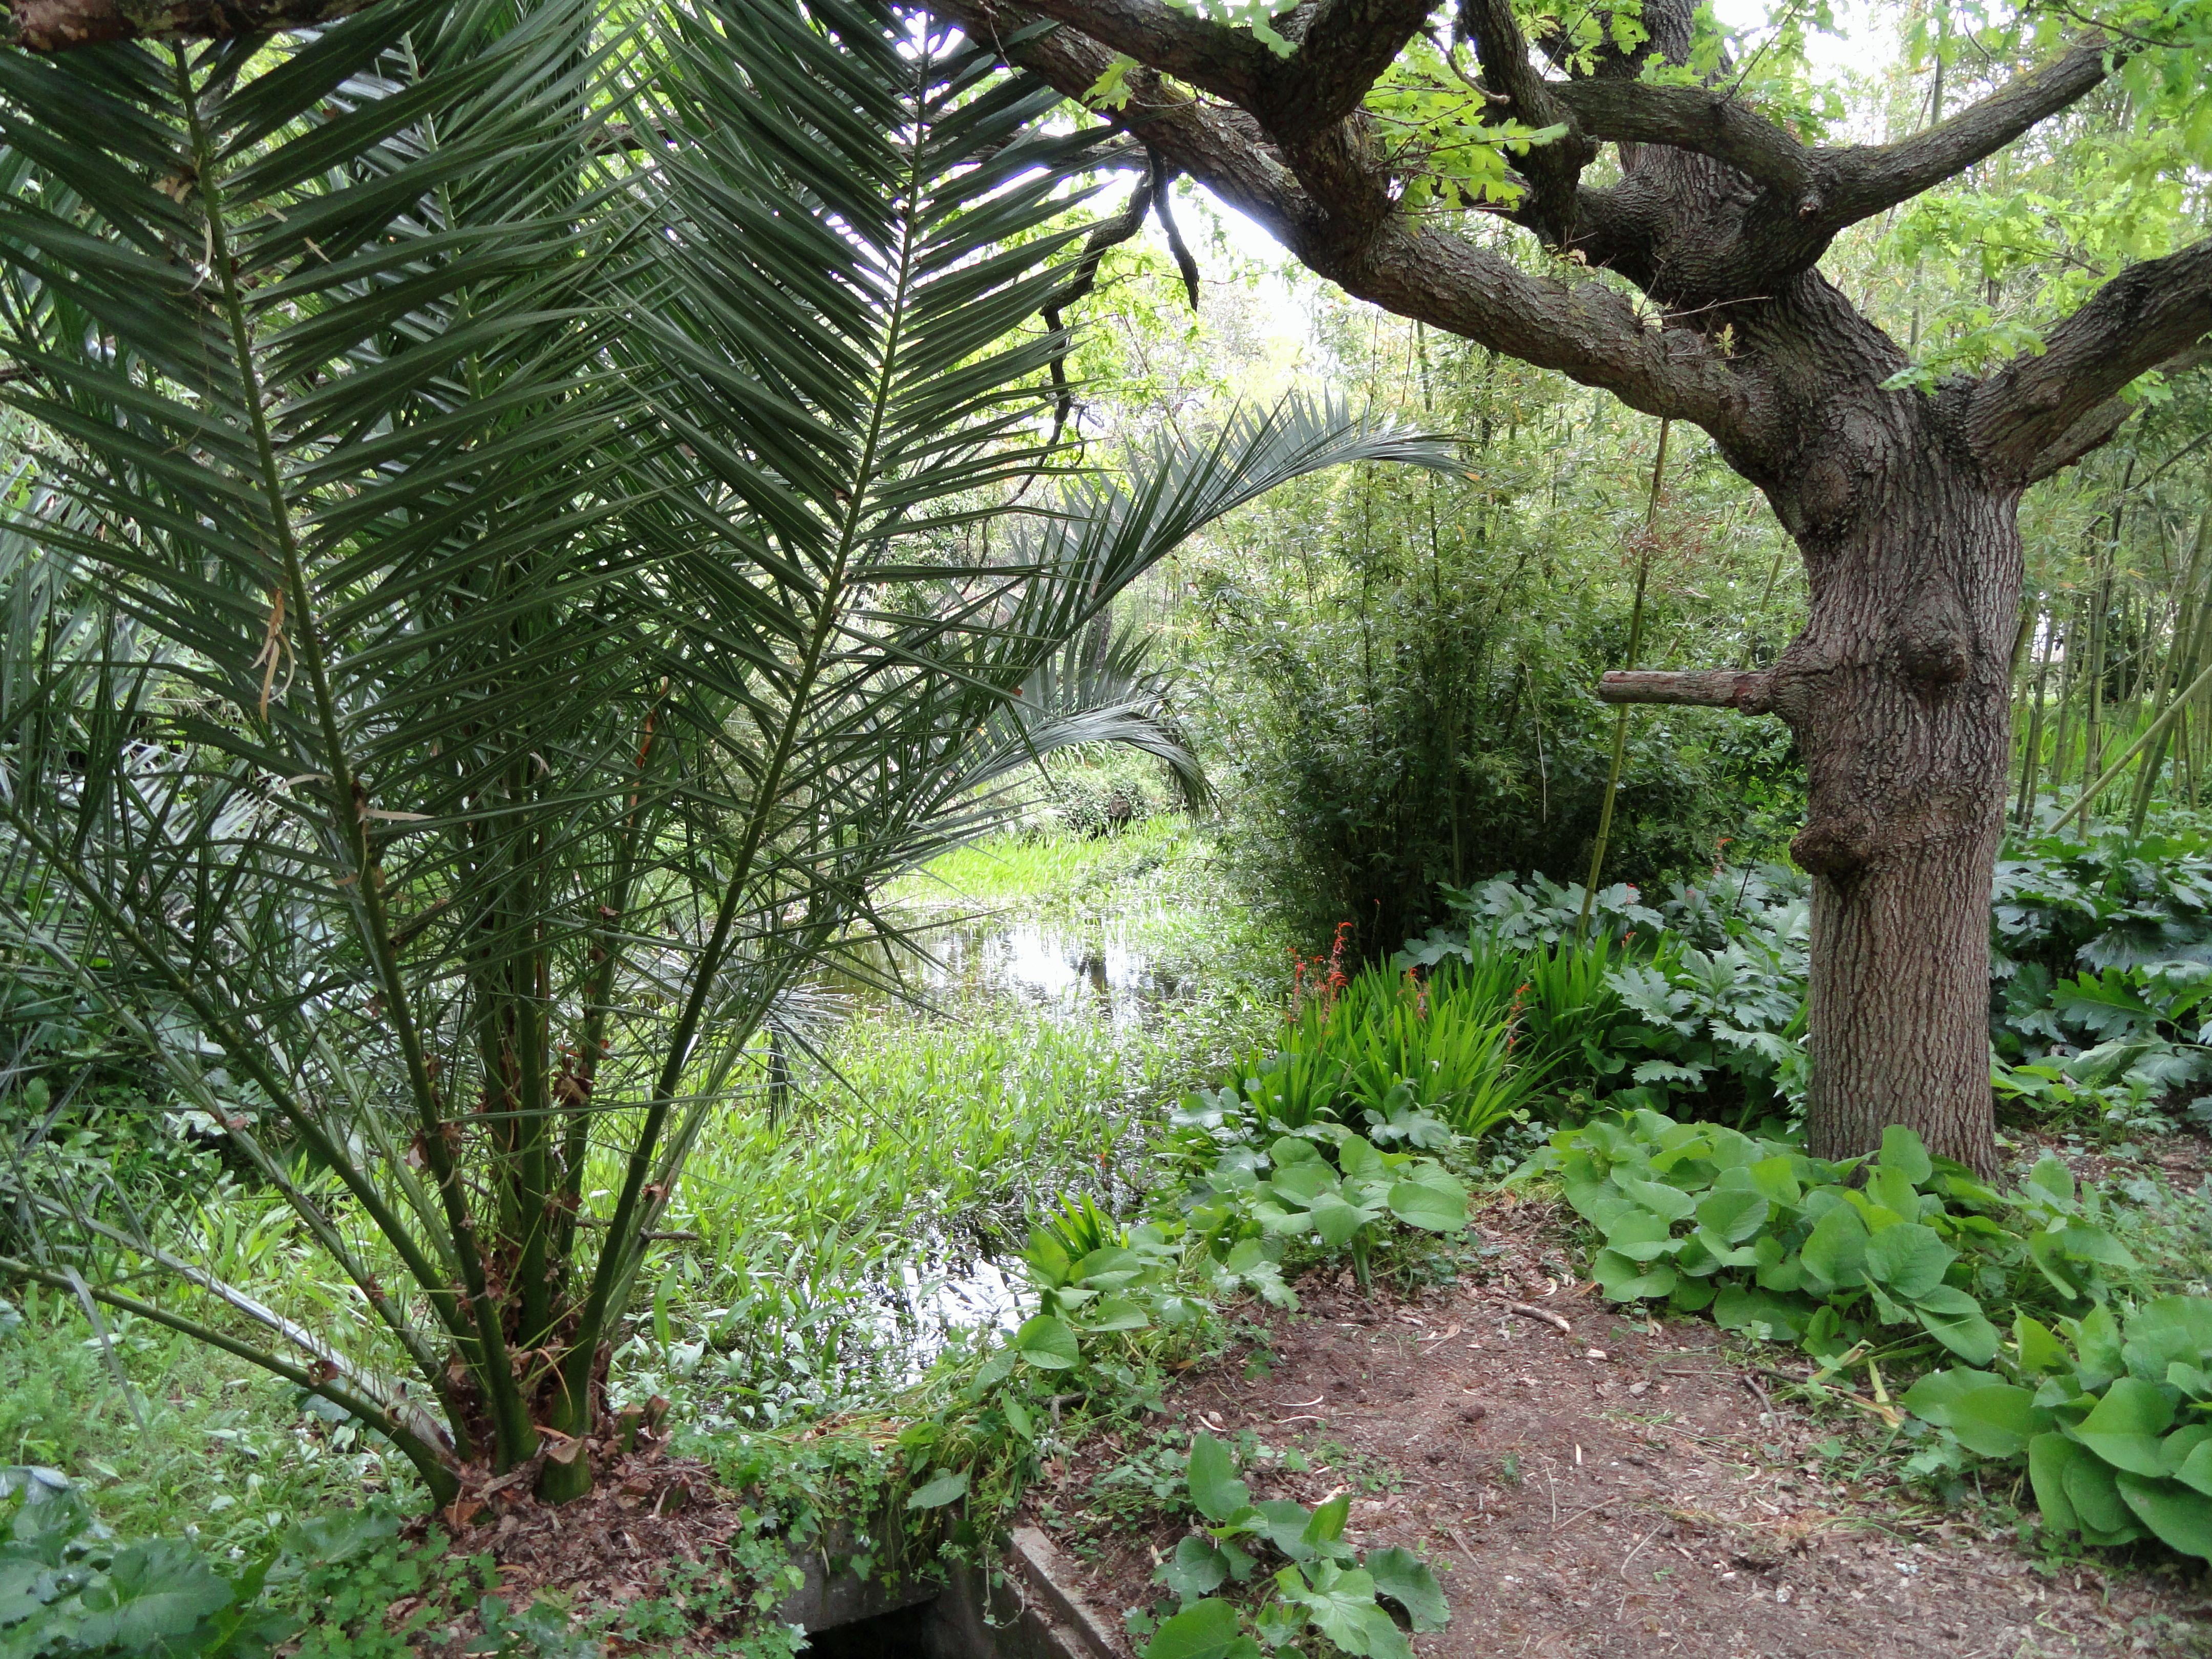 Jardin botanique de la Villa Thuret - Wikipedia